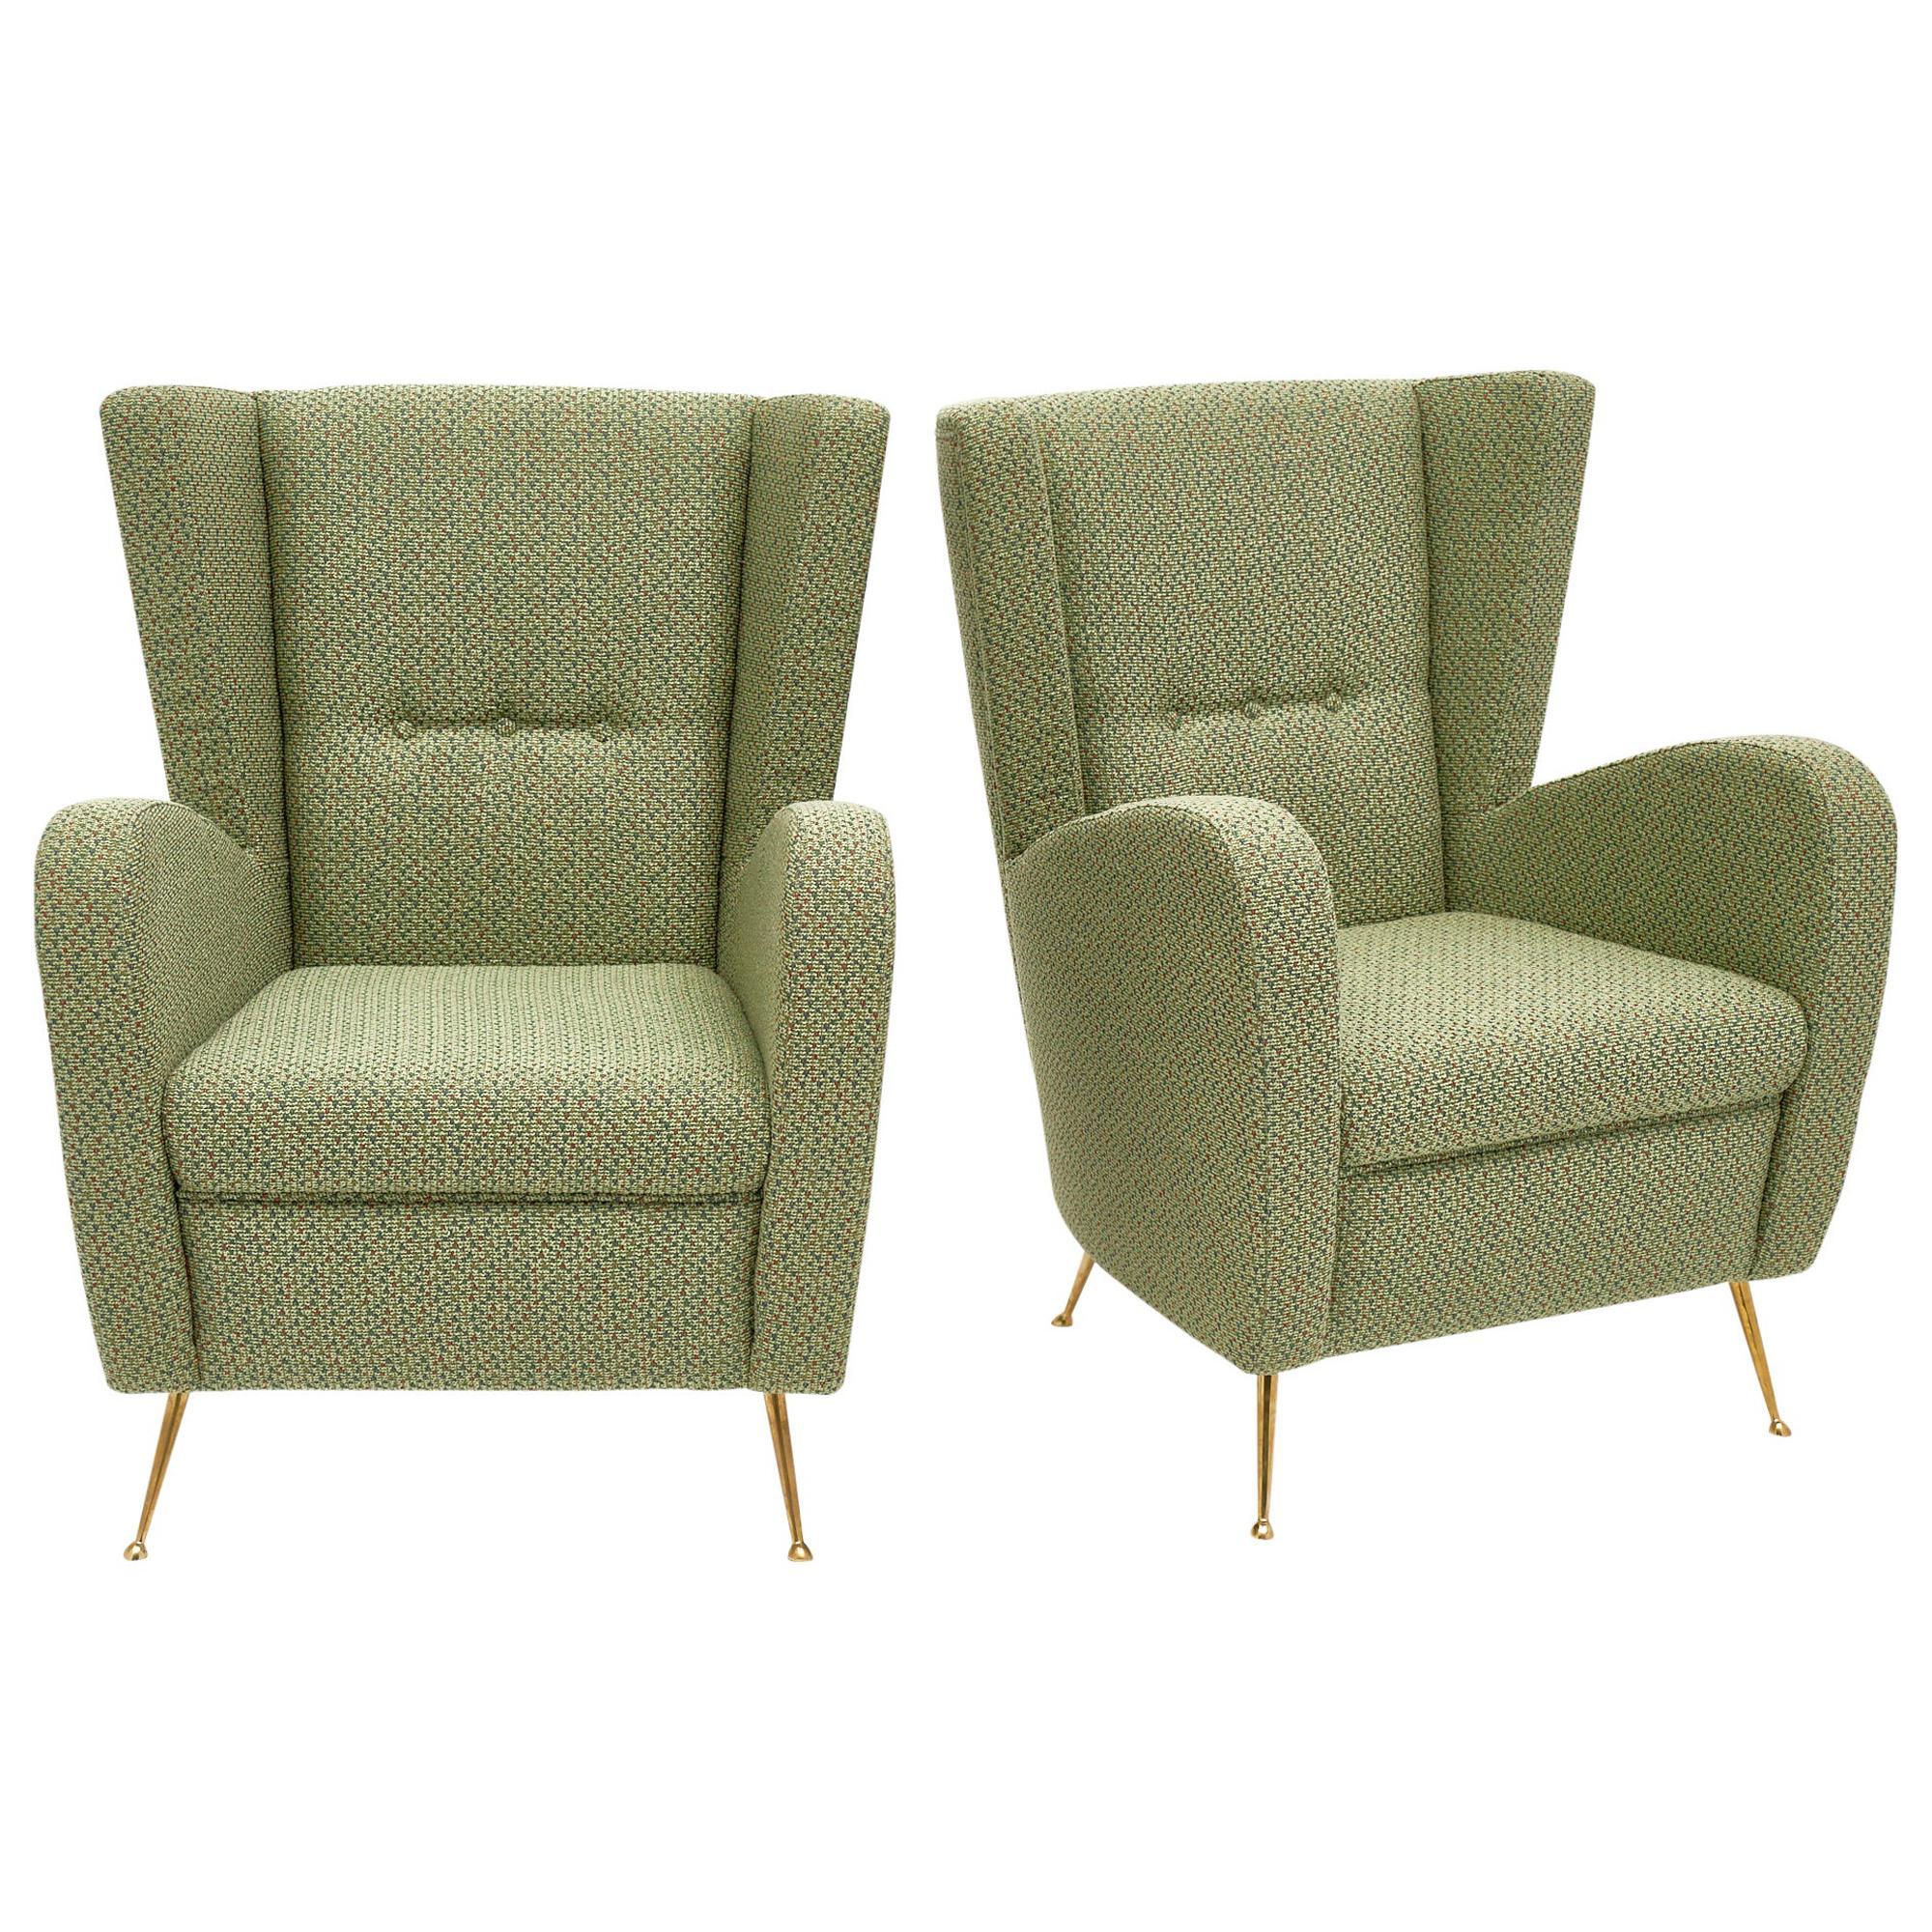 Vintage Green Italian Armchairs by Poltrona Frau